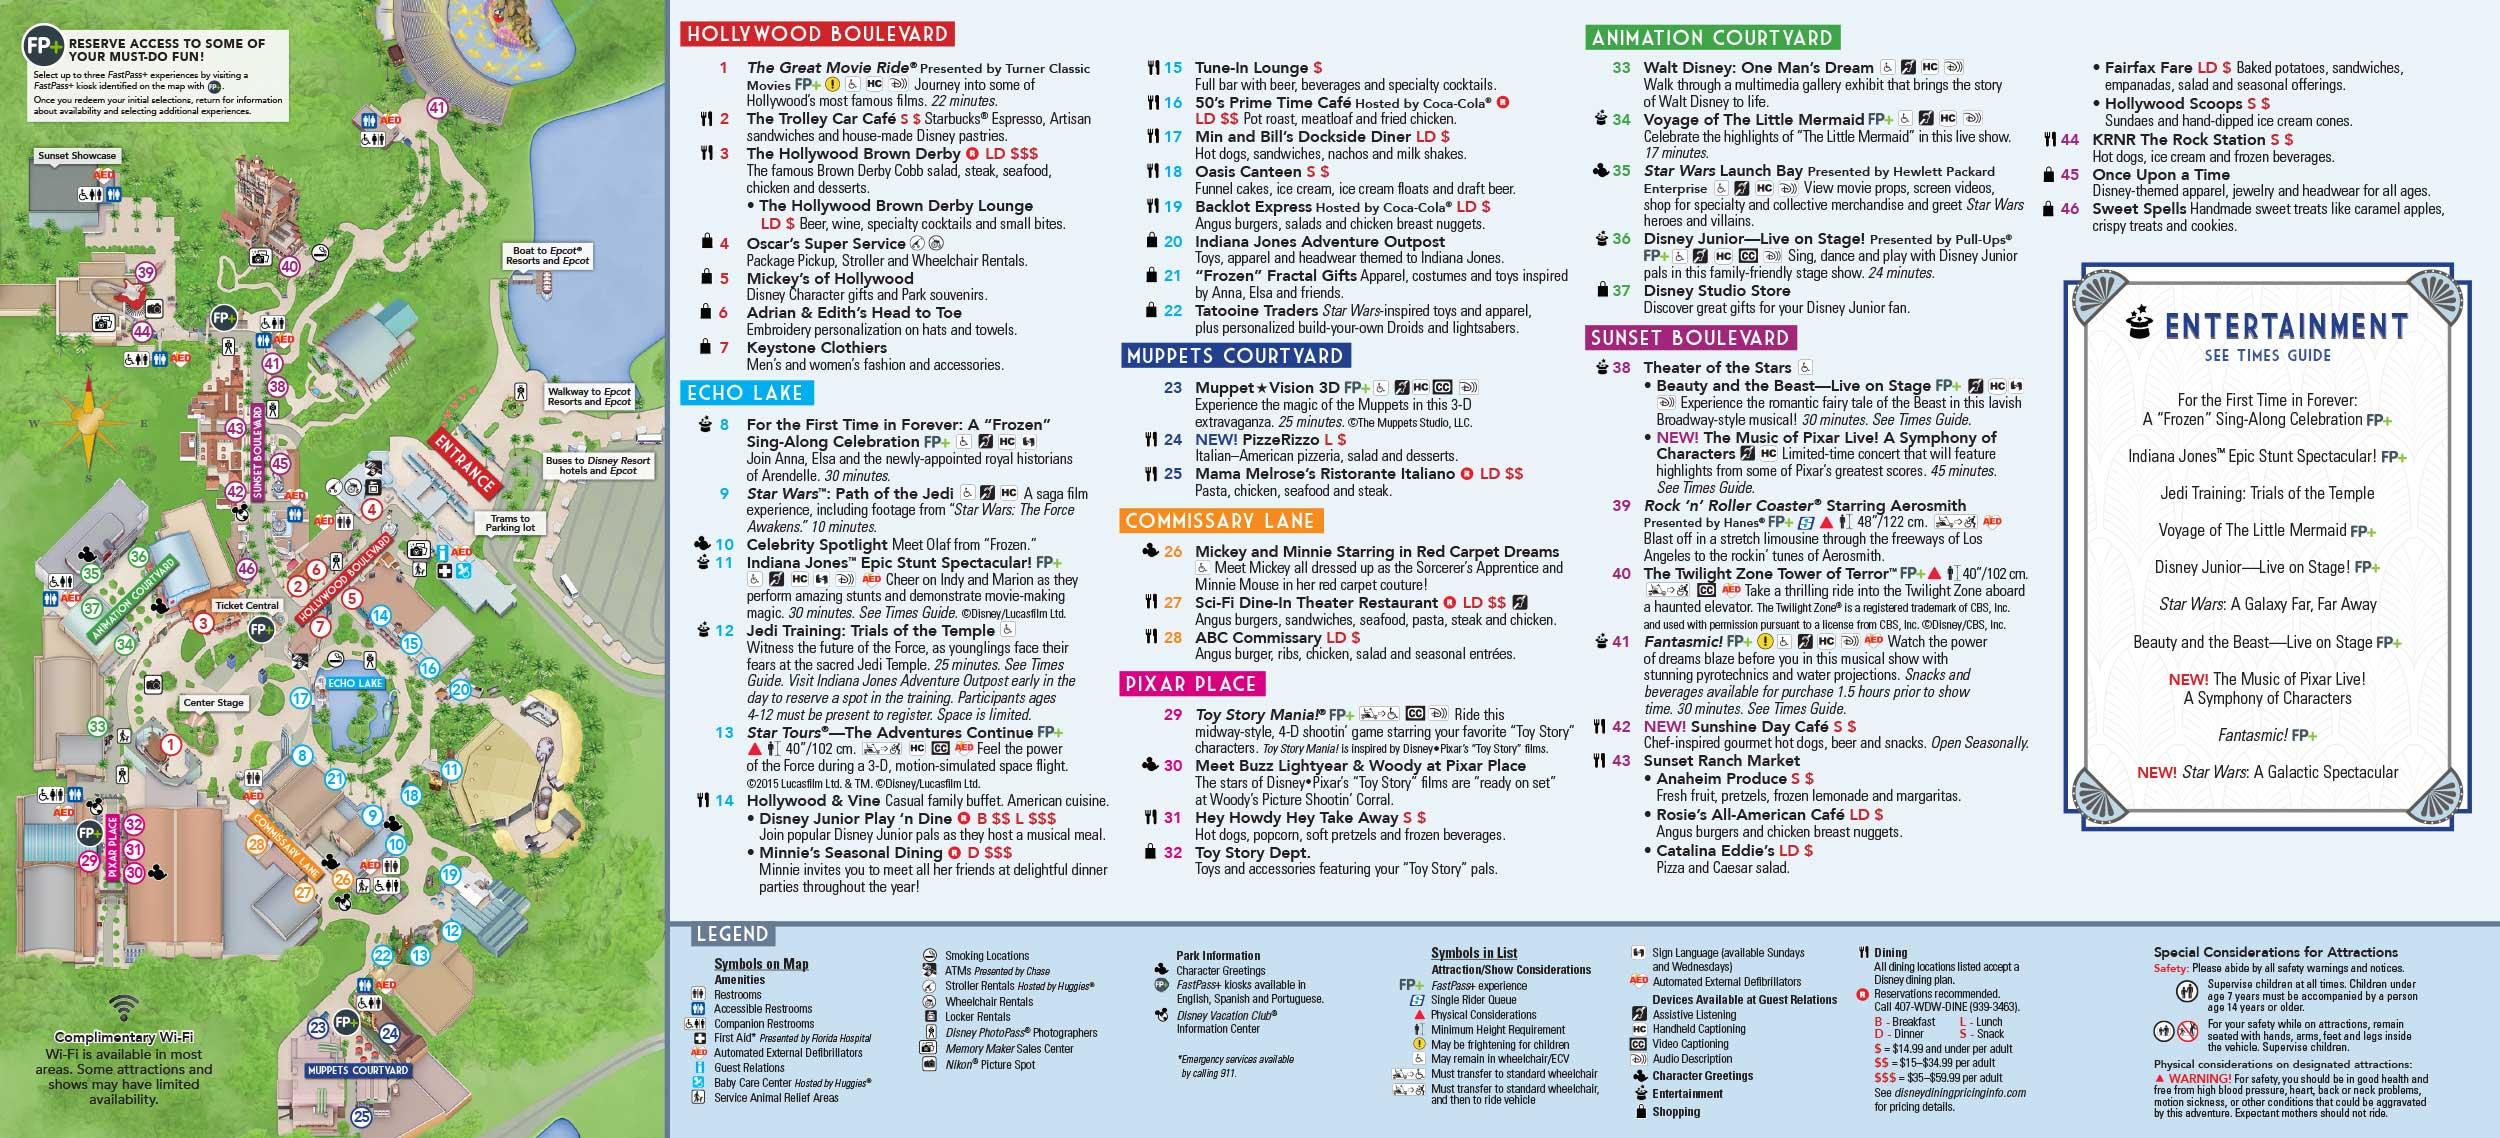 Walt Disney World 7-Day Ultimate Ticket | Disney Memory Maker Bonus!